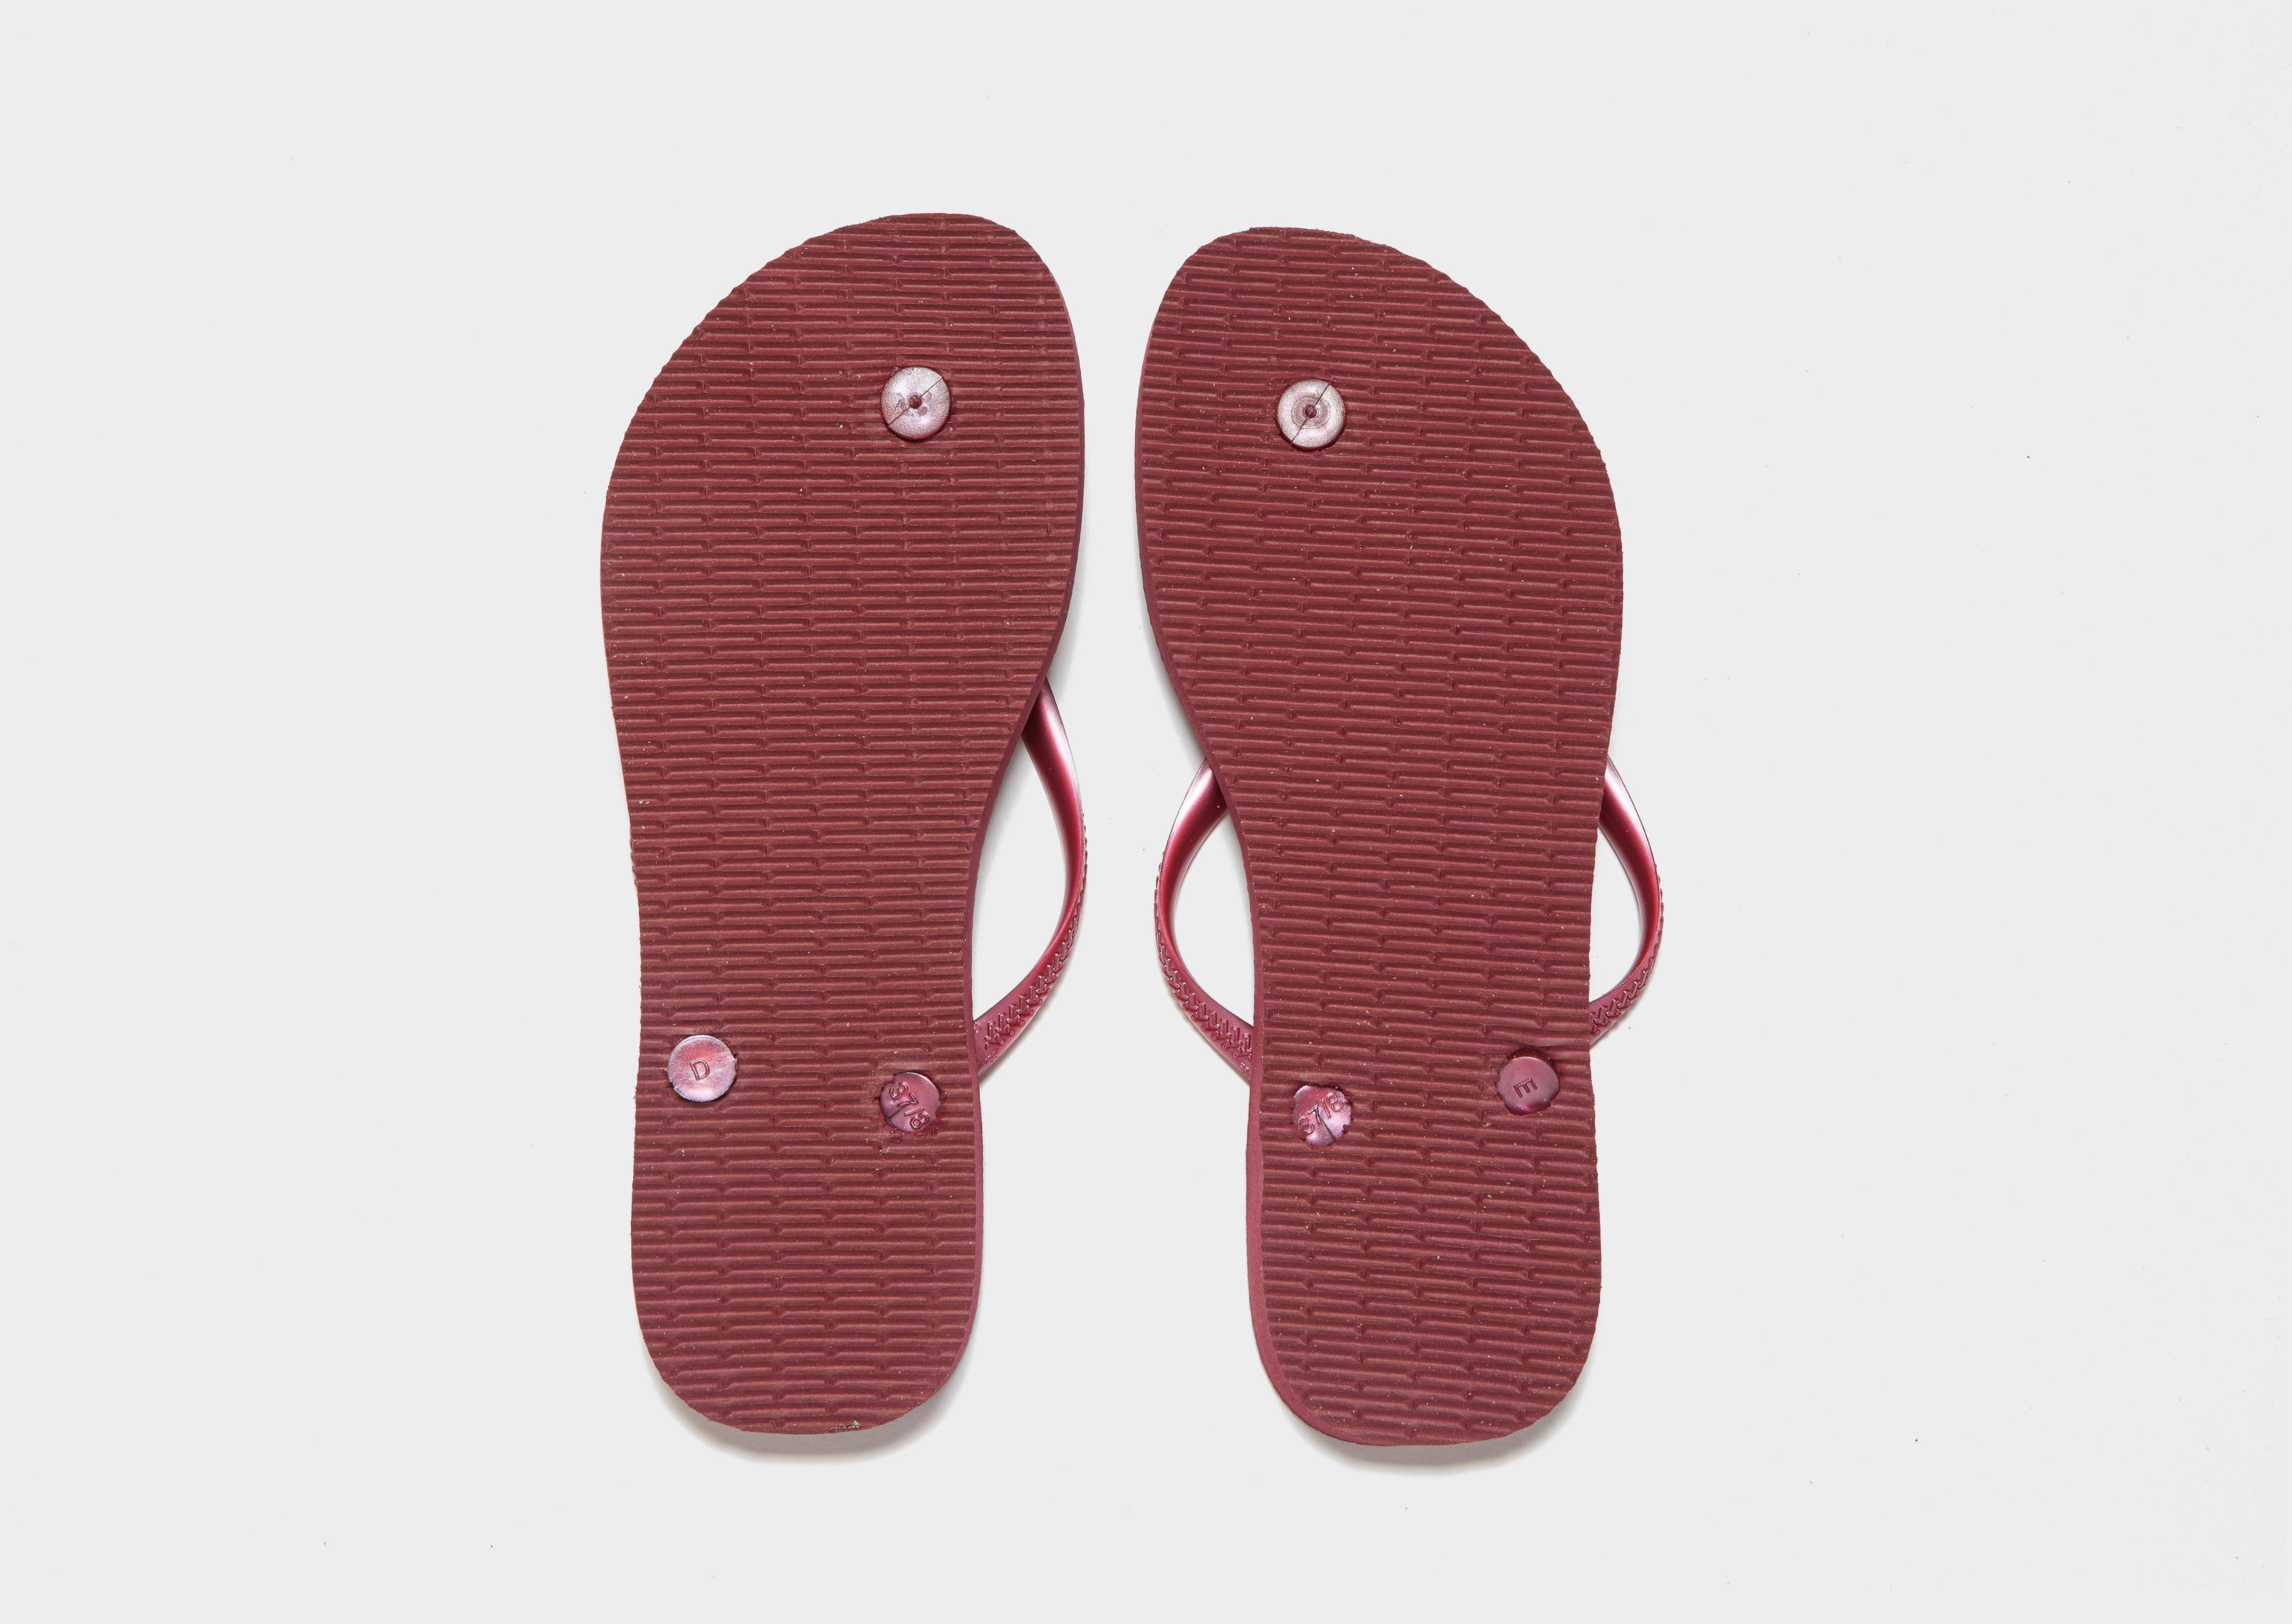 0a02740b9 Havaianas Slim Flip Flops in Pink - Lyst